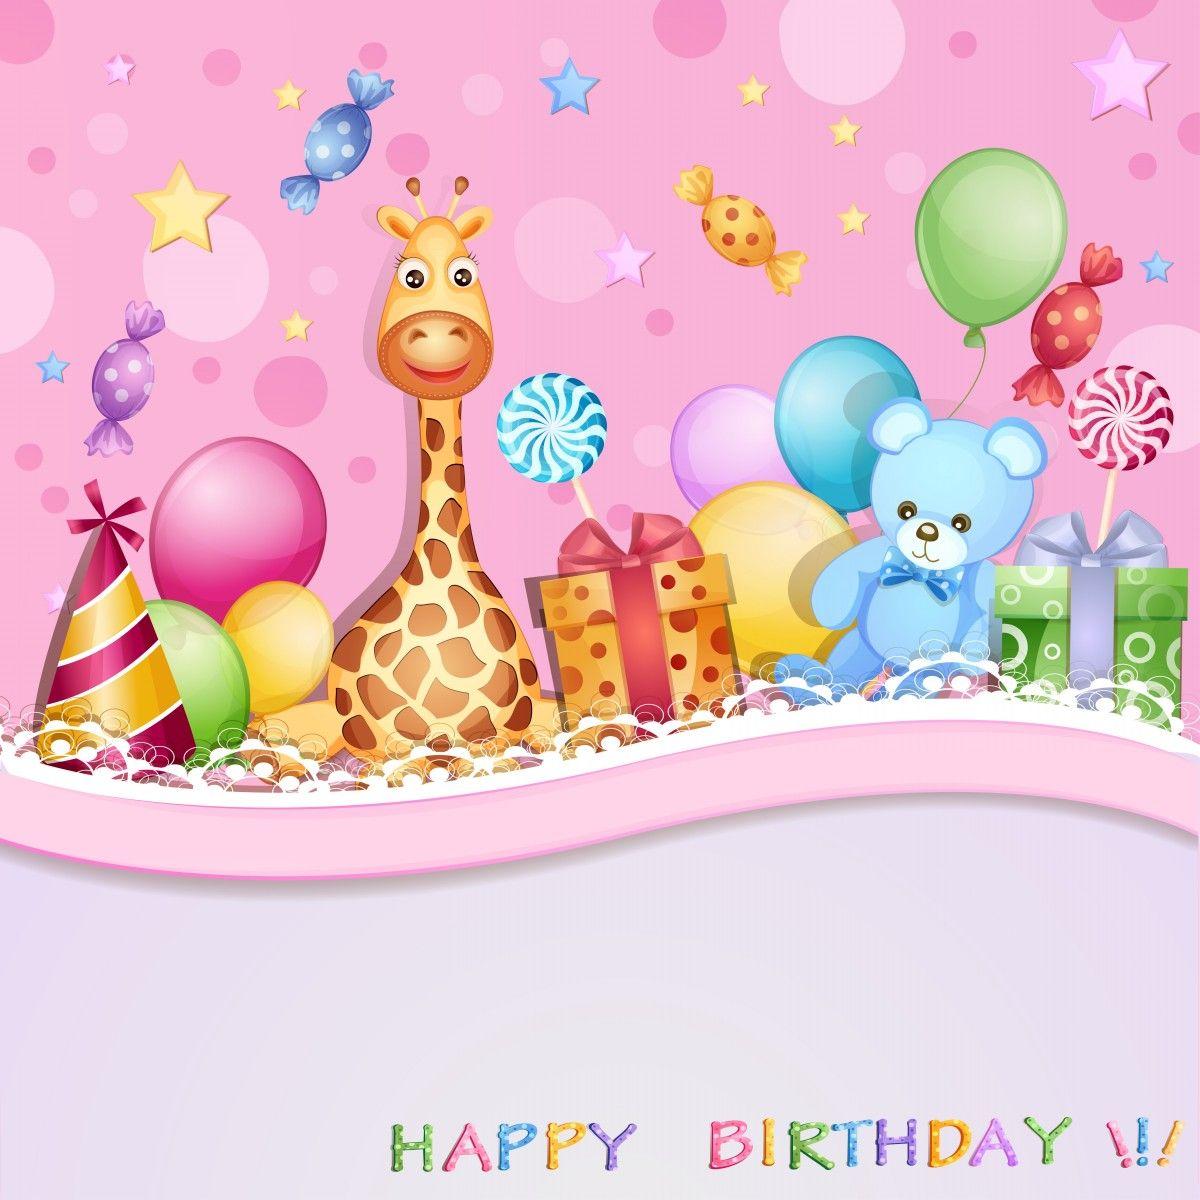 Happy birthday greetings for children j birthday wishes happy birthday greetings for children j kristyandbryce Gallery